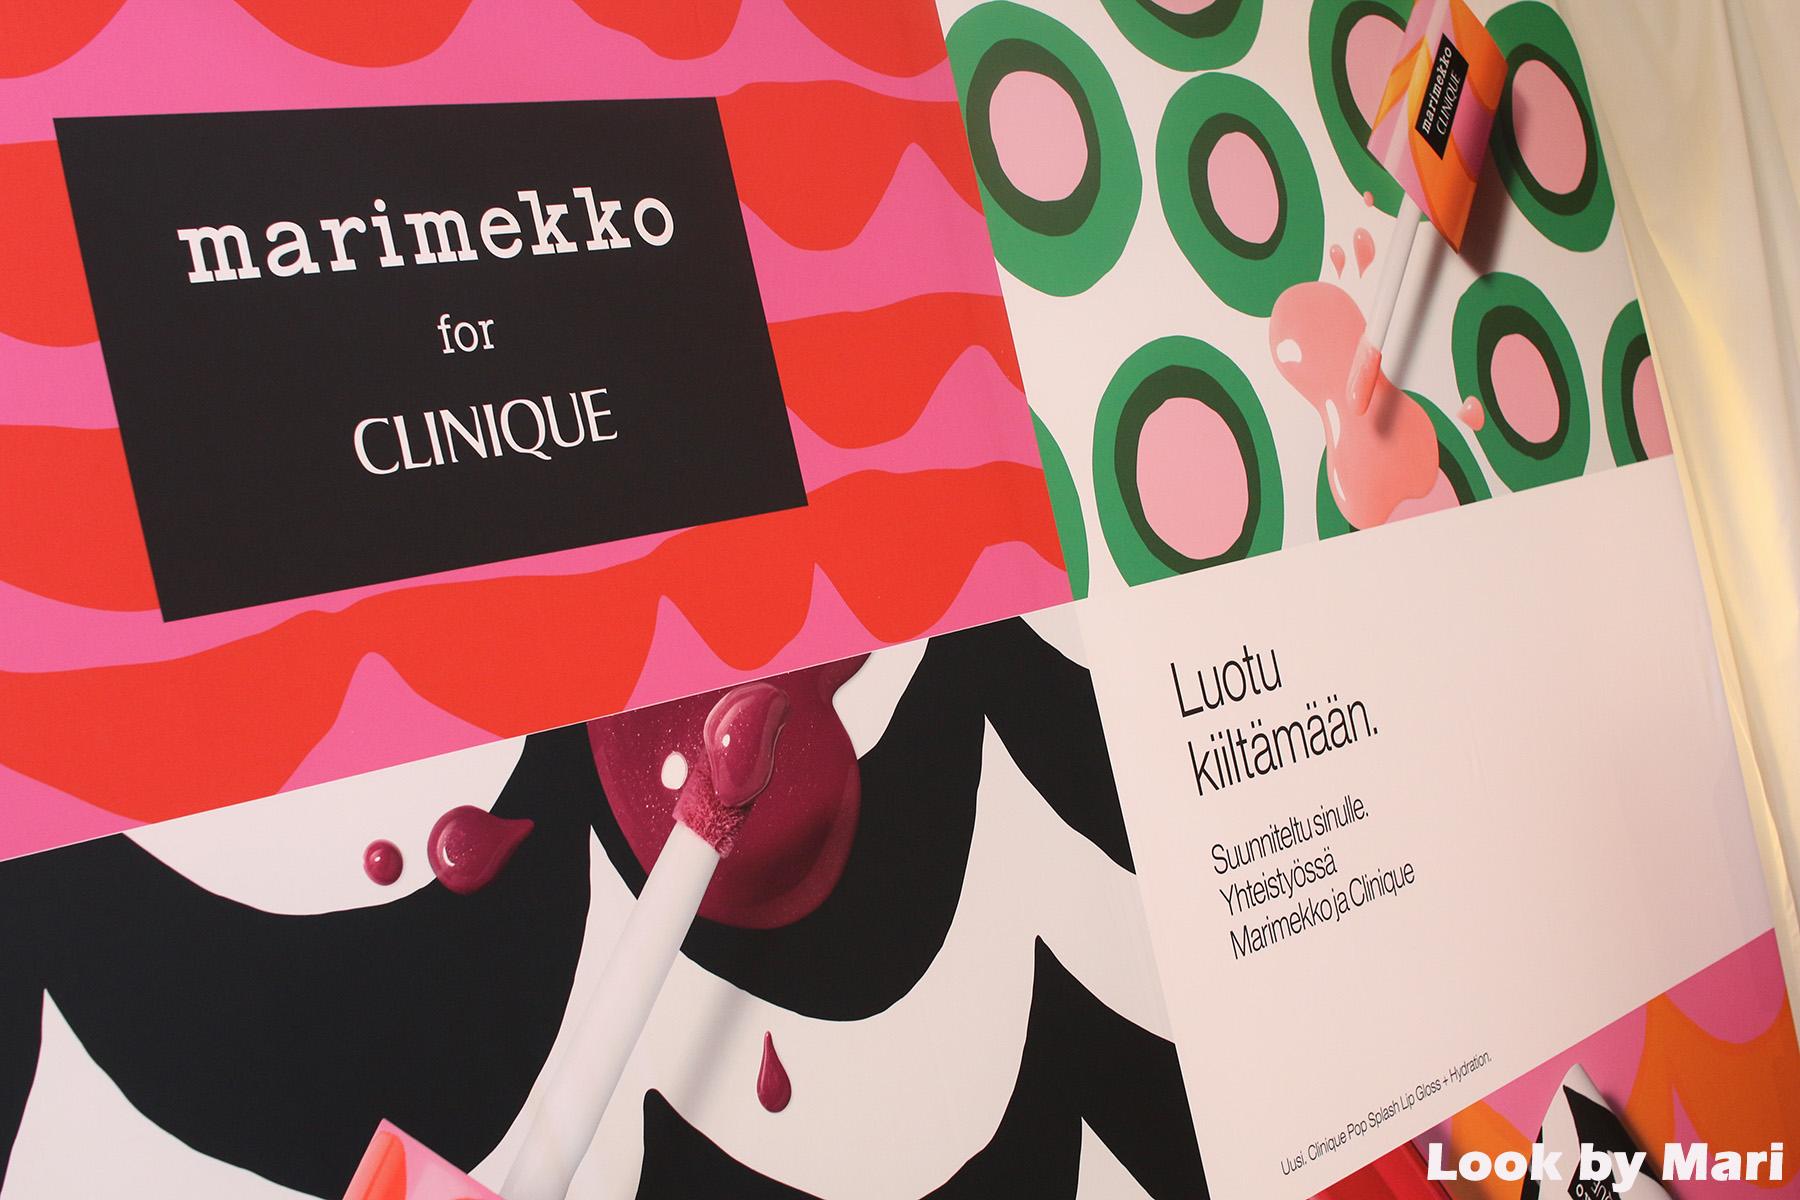 1 marimekko for clinique review products blog-2